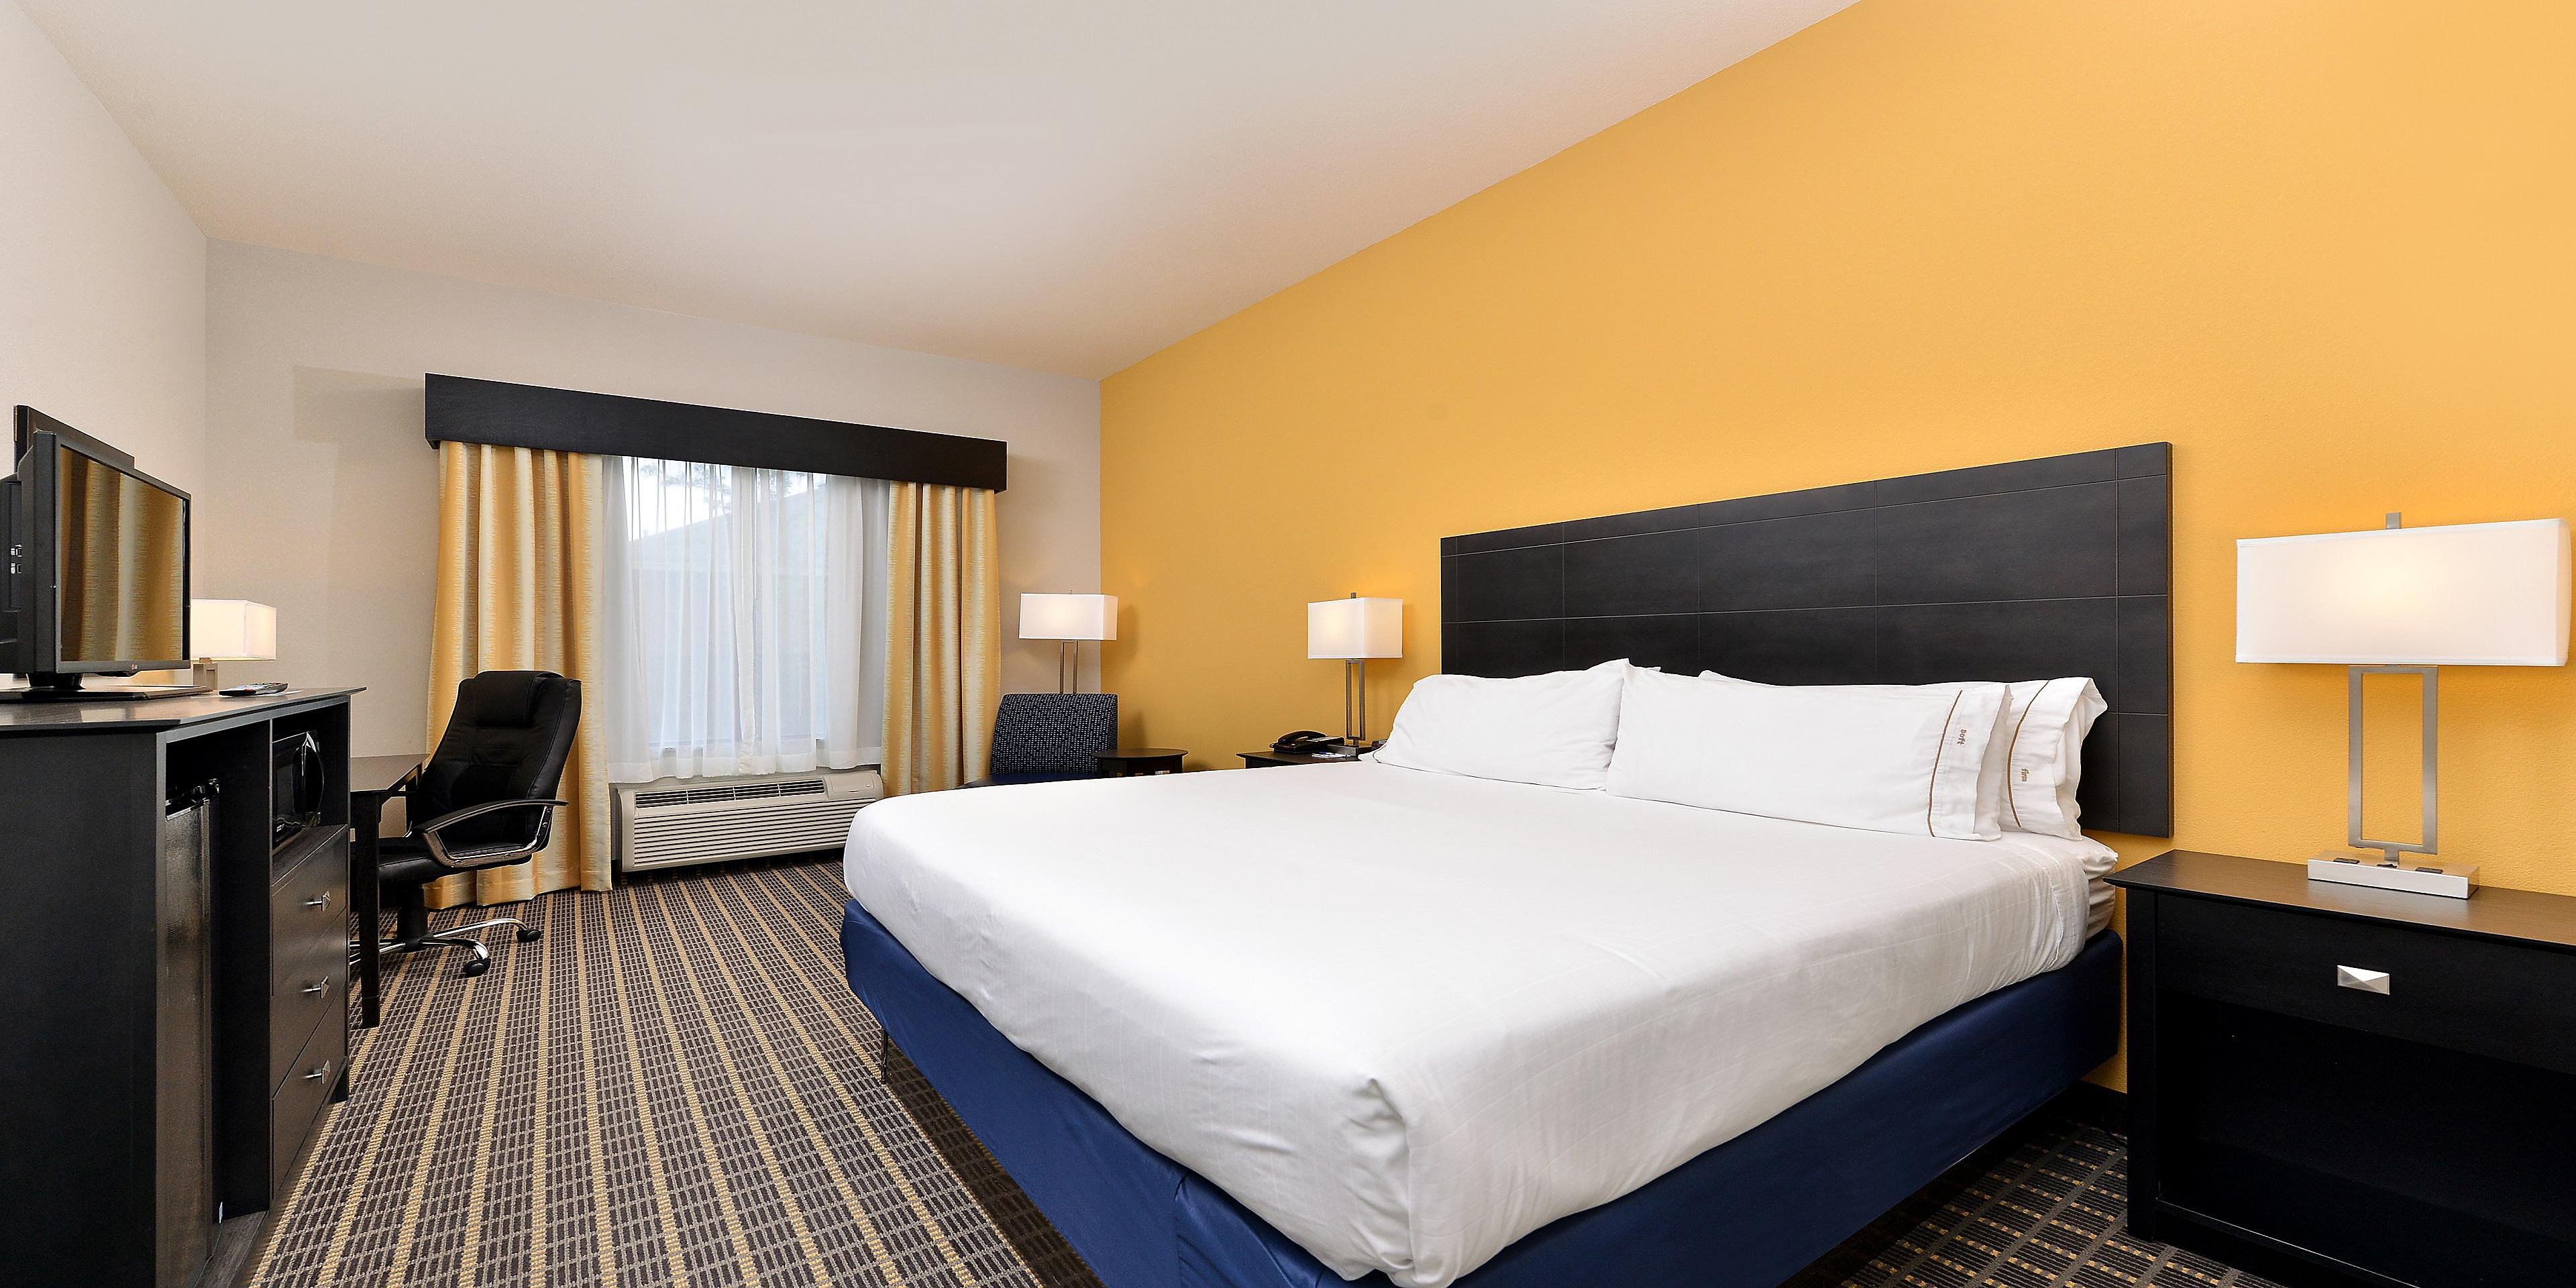 Holiday Inn Express & Suites Fort Walton Beach Northwest Hotel by IHG